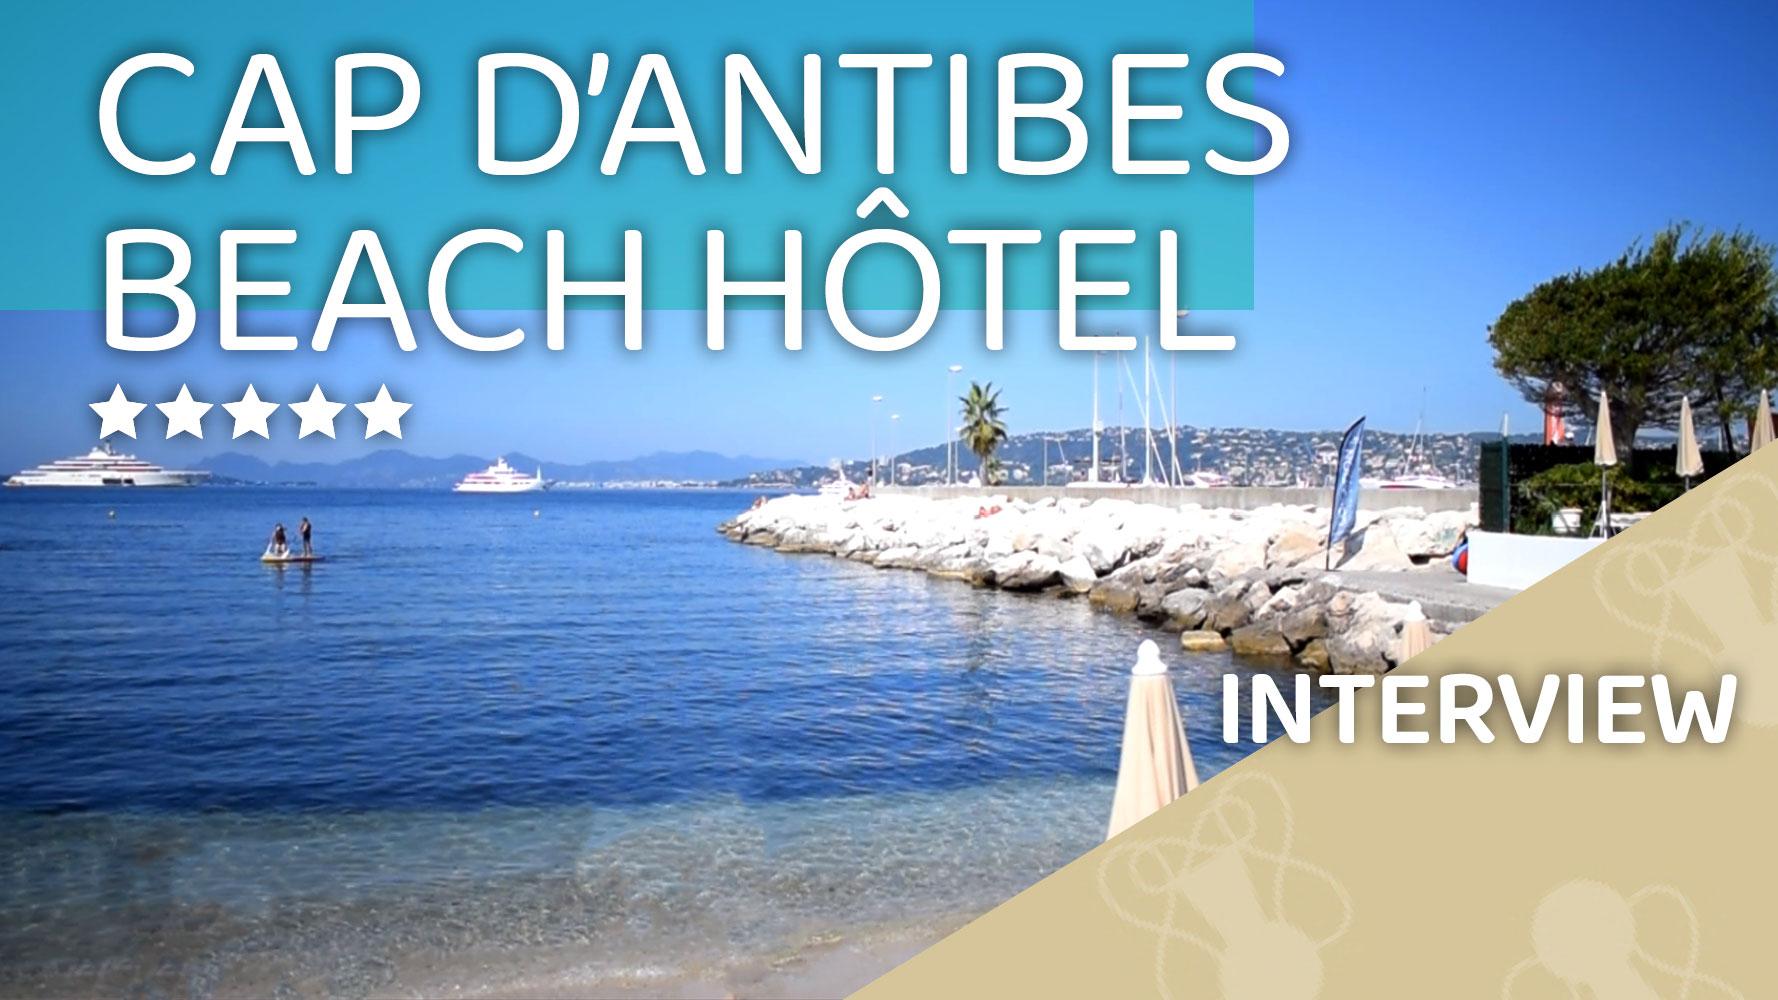 cap d antibes beach hotel